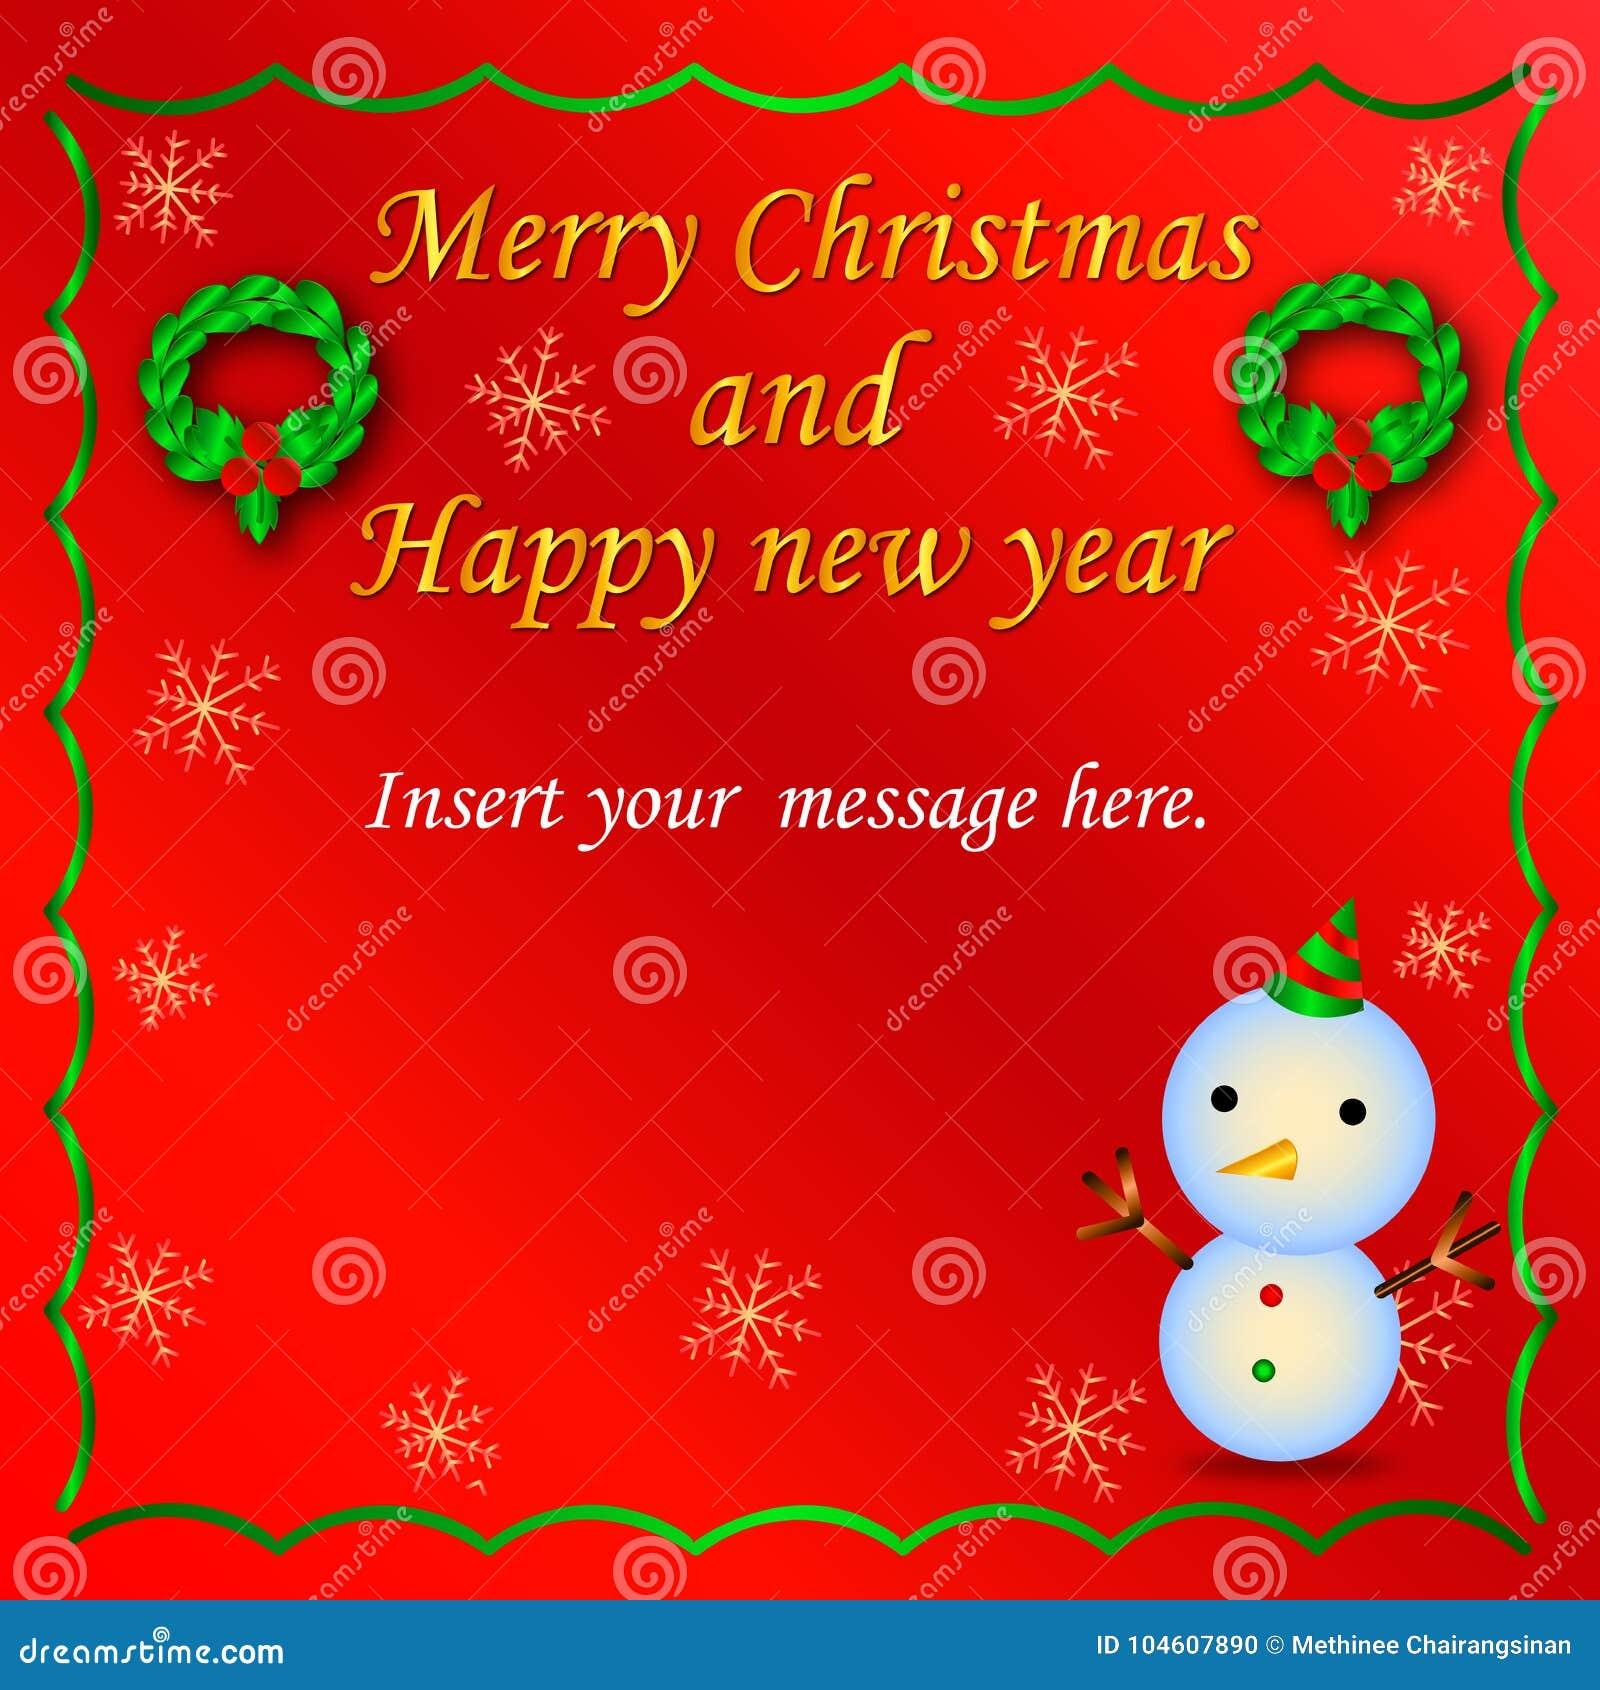 Lovely christmas card vector pattern 1 stock vector illustration download lovely christmas card vector pattern 1 stock vector illustration of pattern lover m4hsunfo